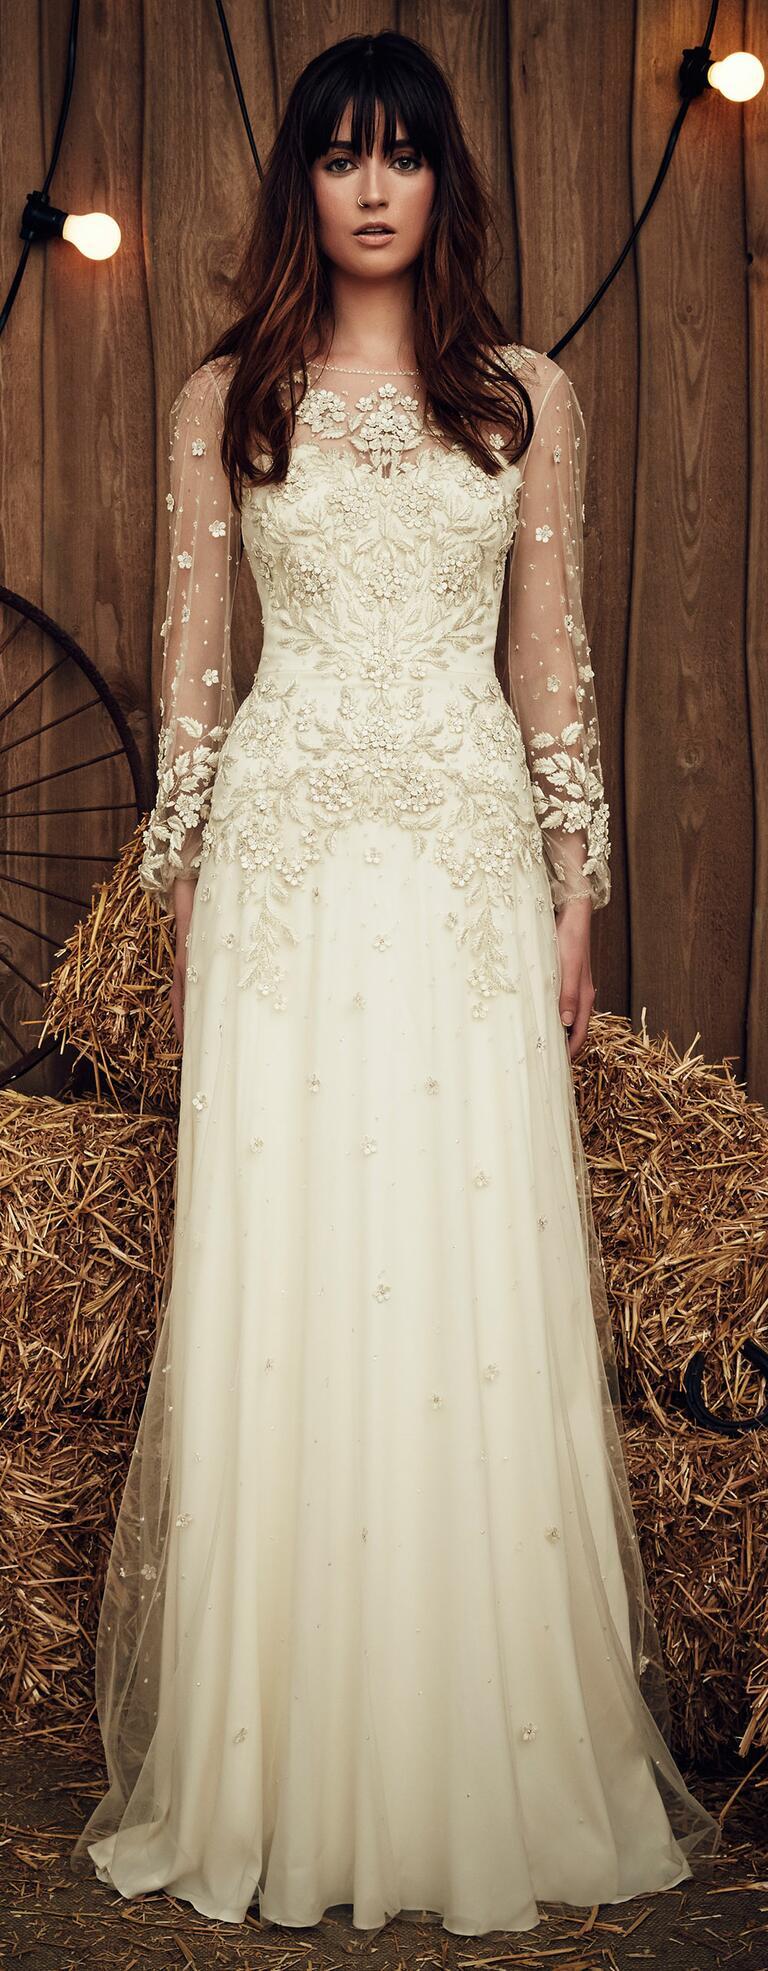 Jenny packham spring 2017 collection bridal fashion week for Jenny packham wedding dress